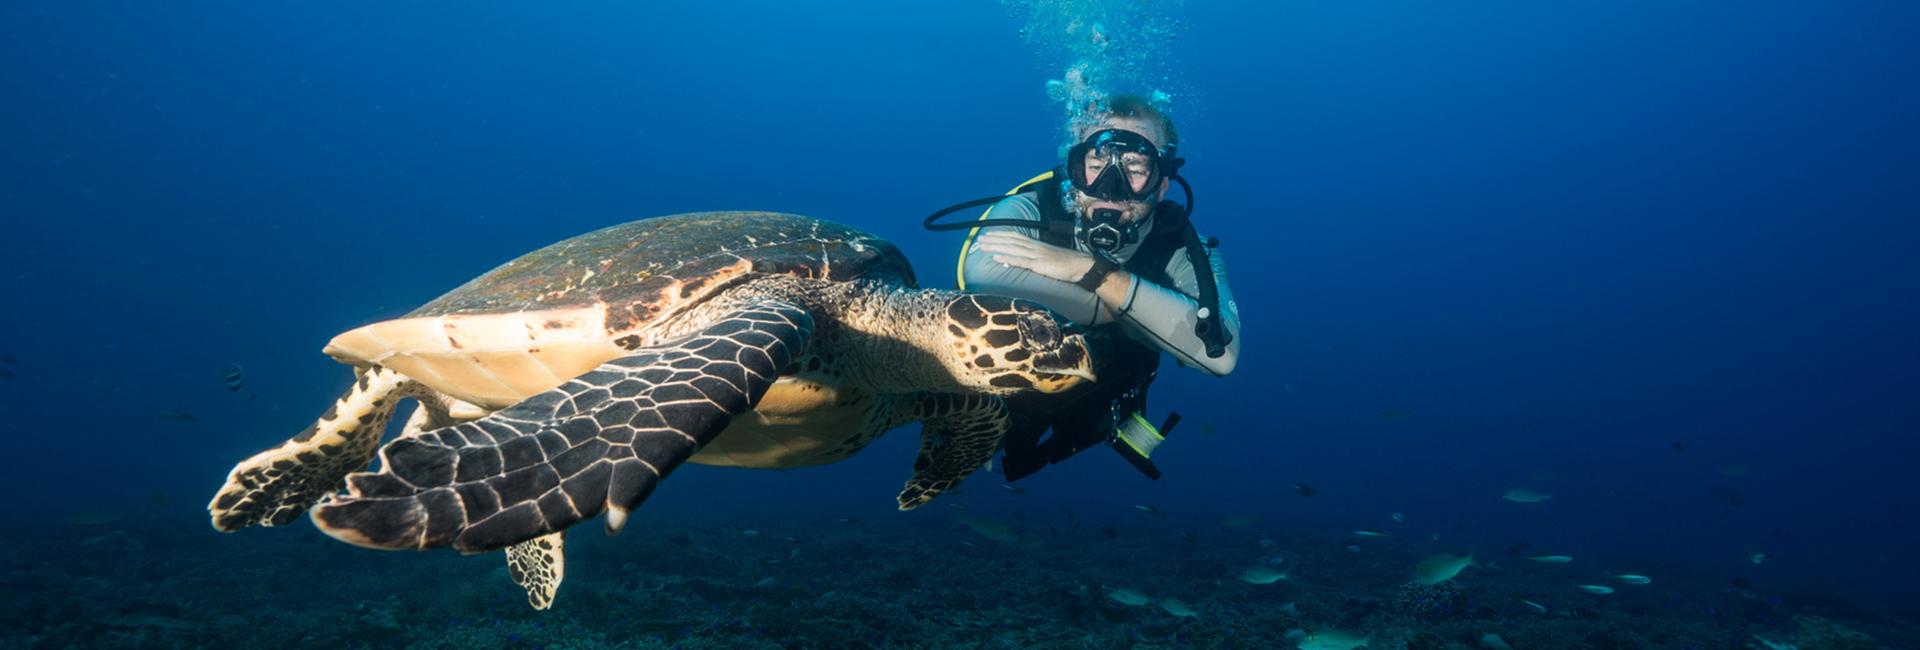 Travel With Purpose Turtles